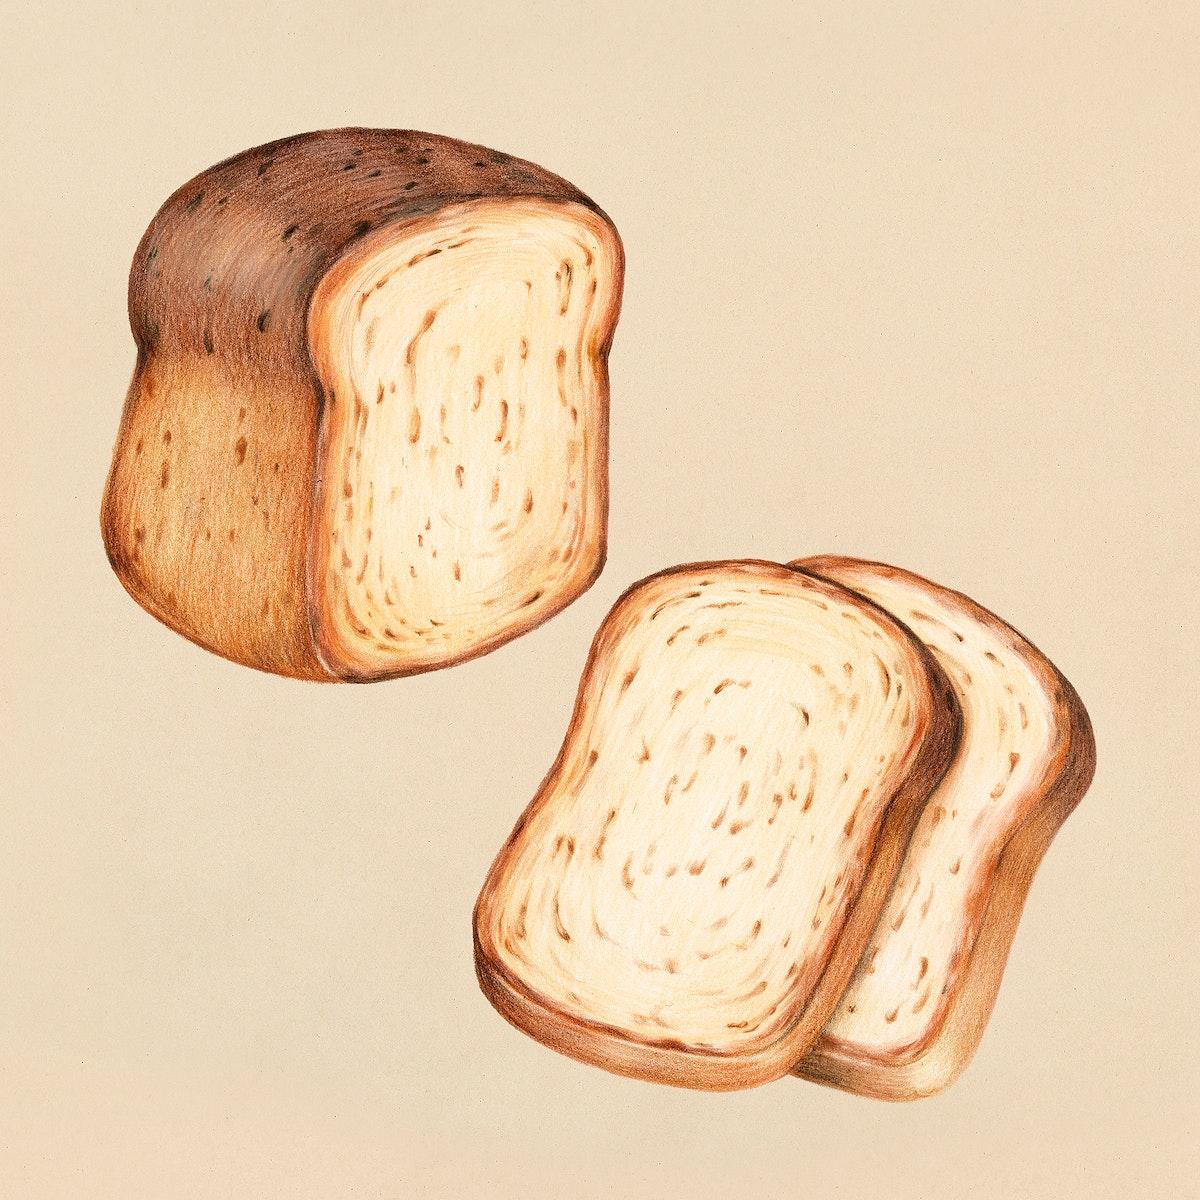 Freshly baked bread hand-drawn illustration